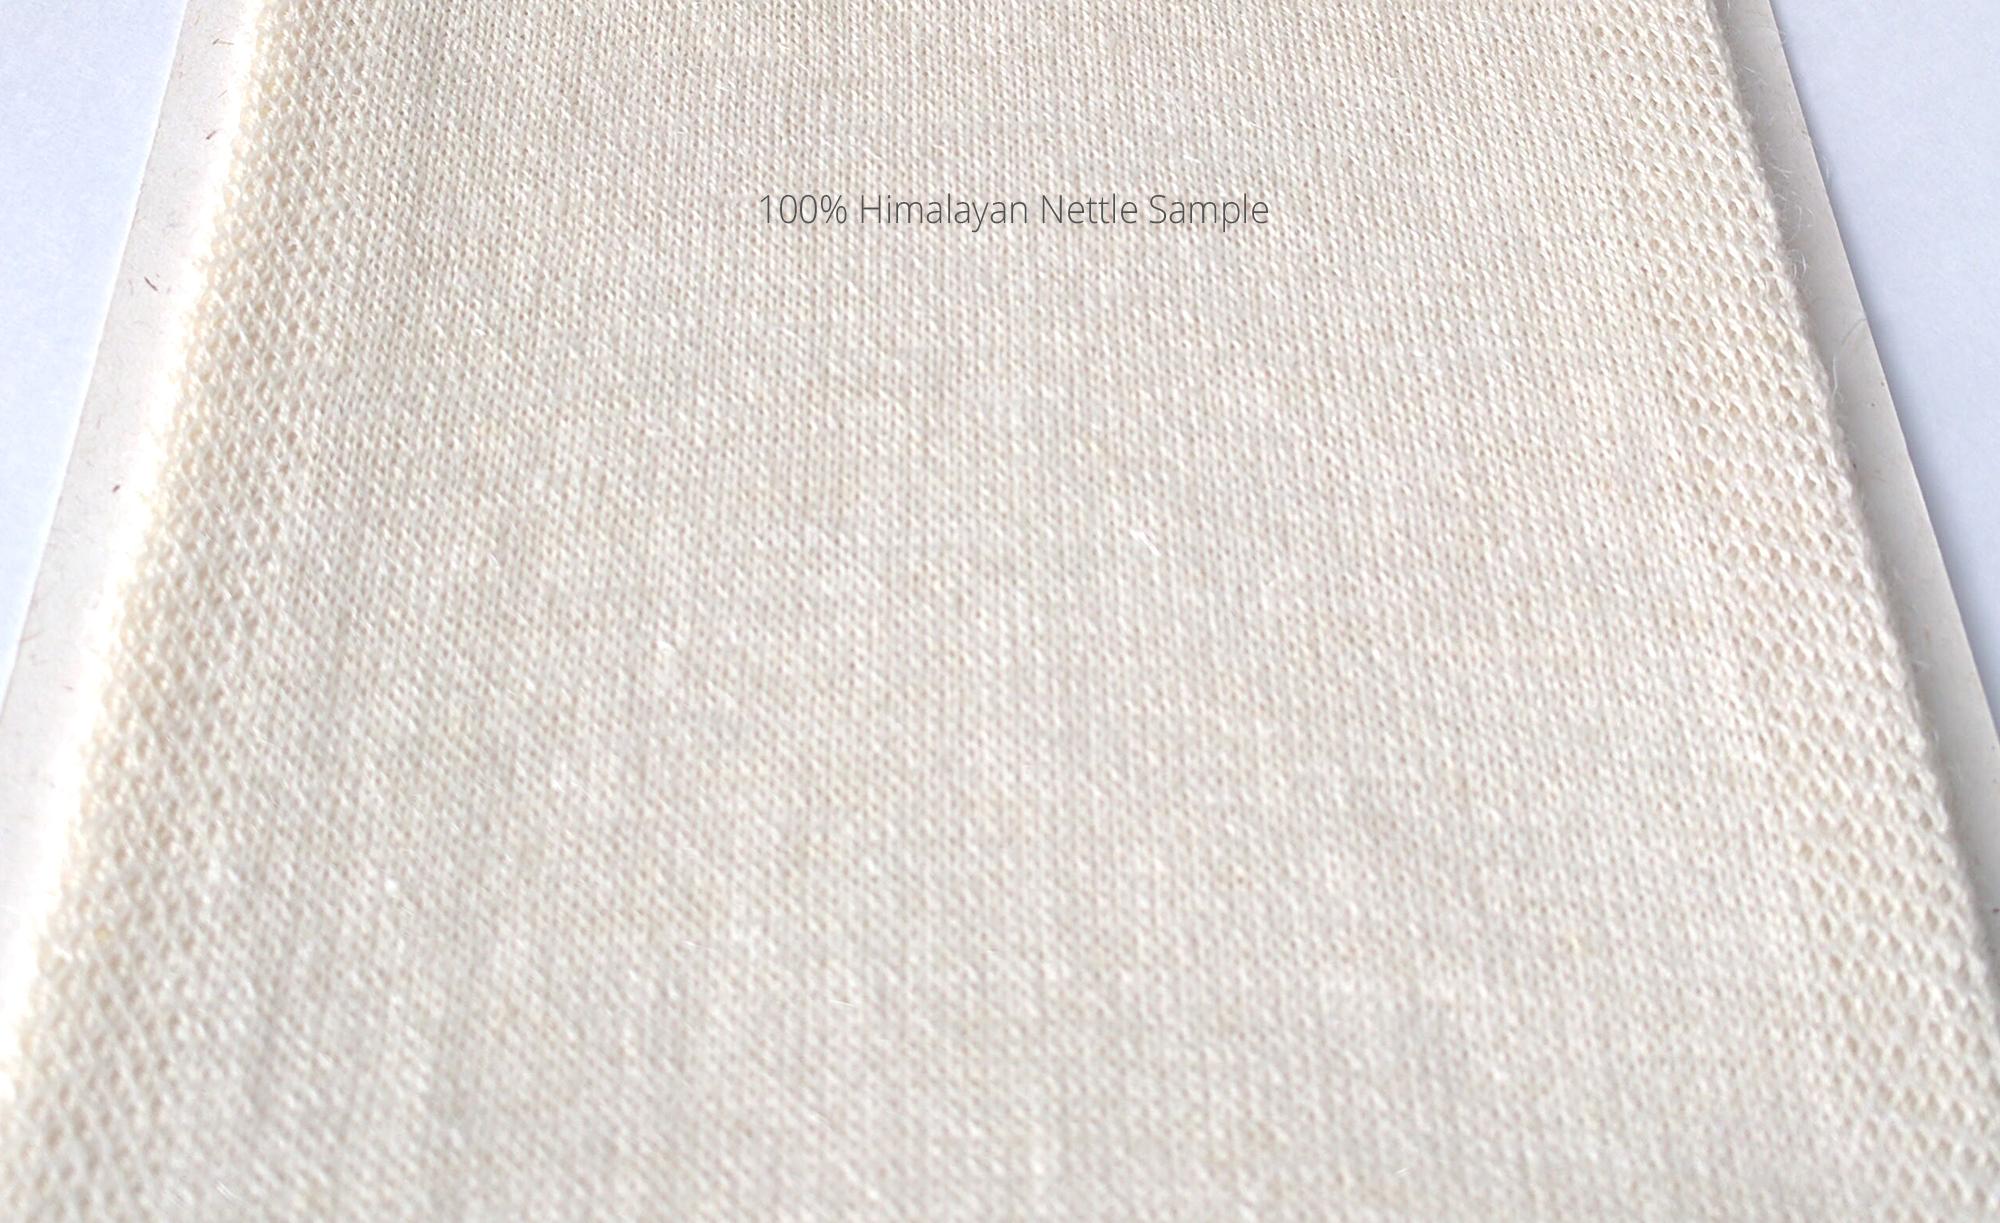 100% Himalayan nettle sample